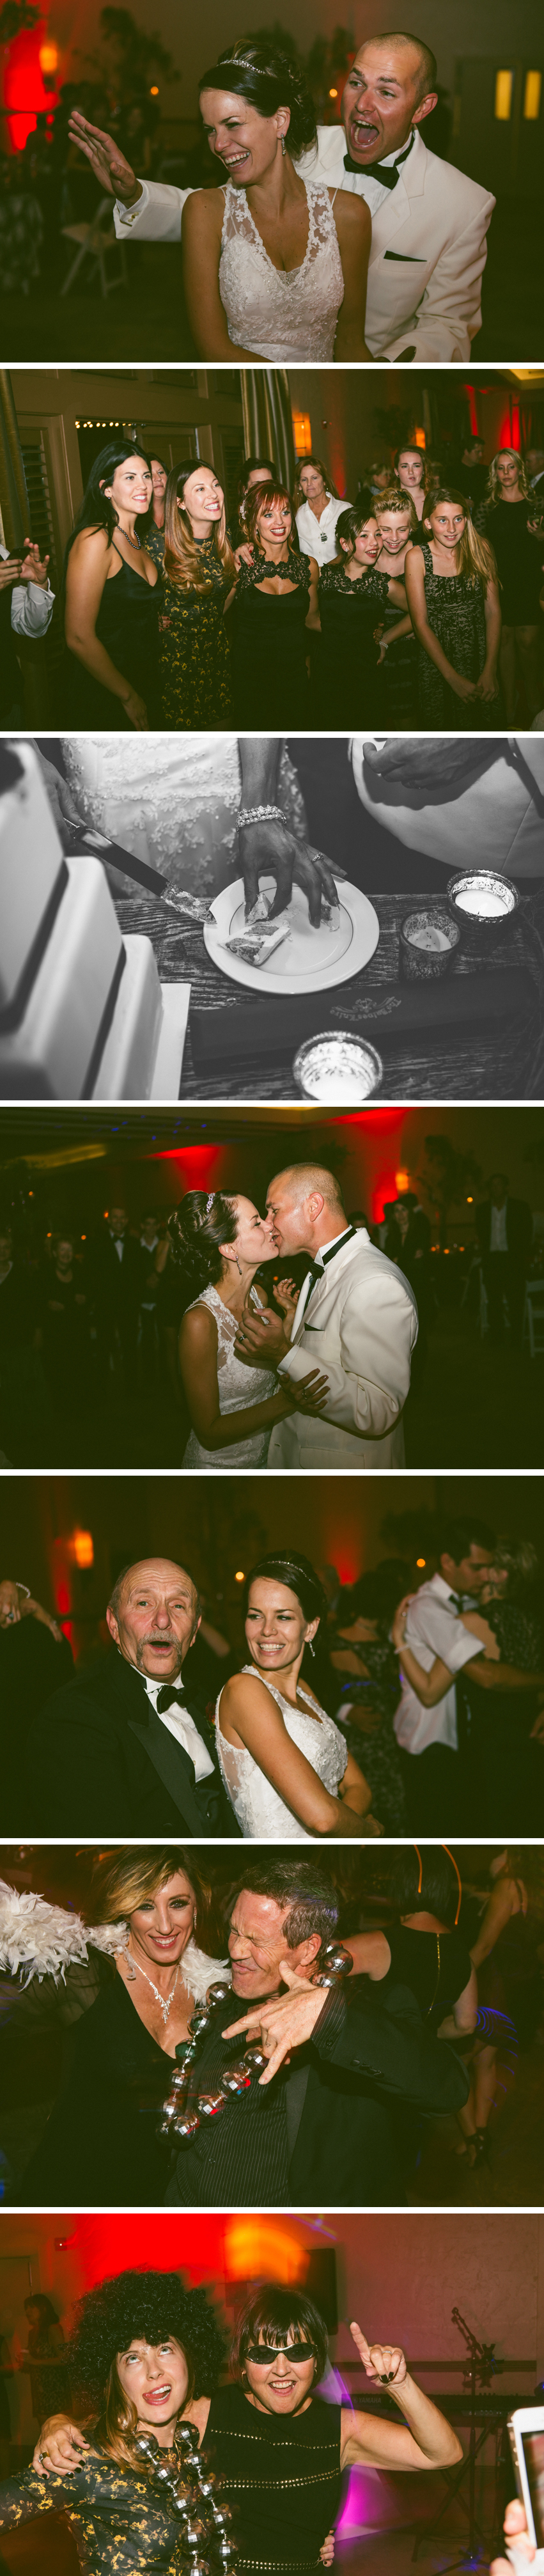 TCI-wedding17